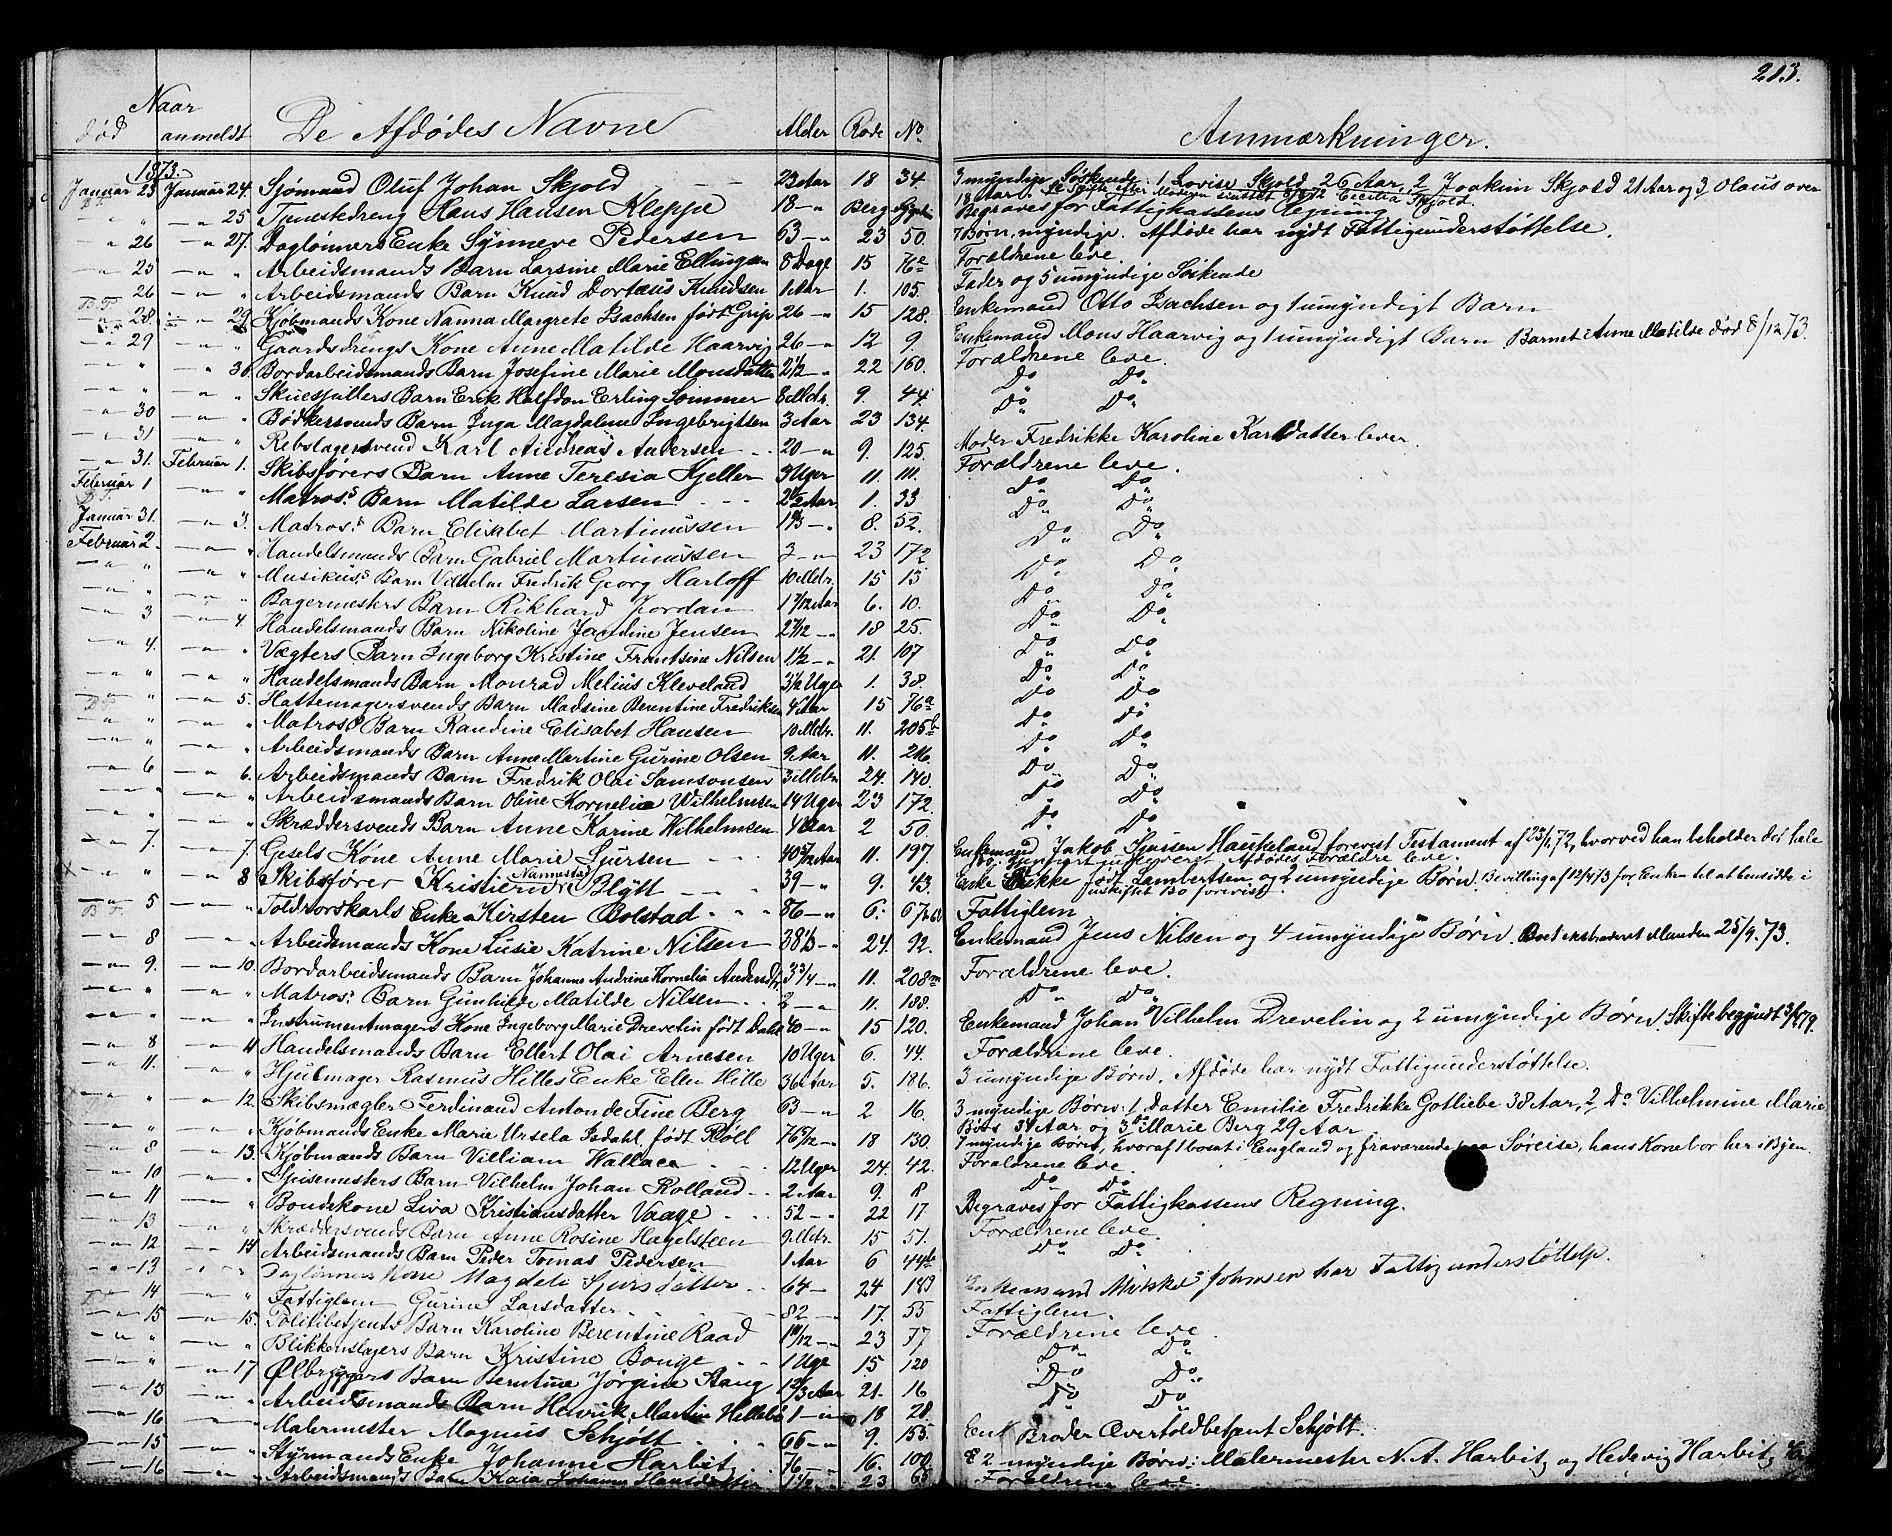 SAB, Byfogd og Byskriver i Bergen, 06/06Na/L0003: Dødsfallsjournaler, 1861-1878, s. 212b-213a